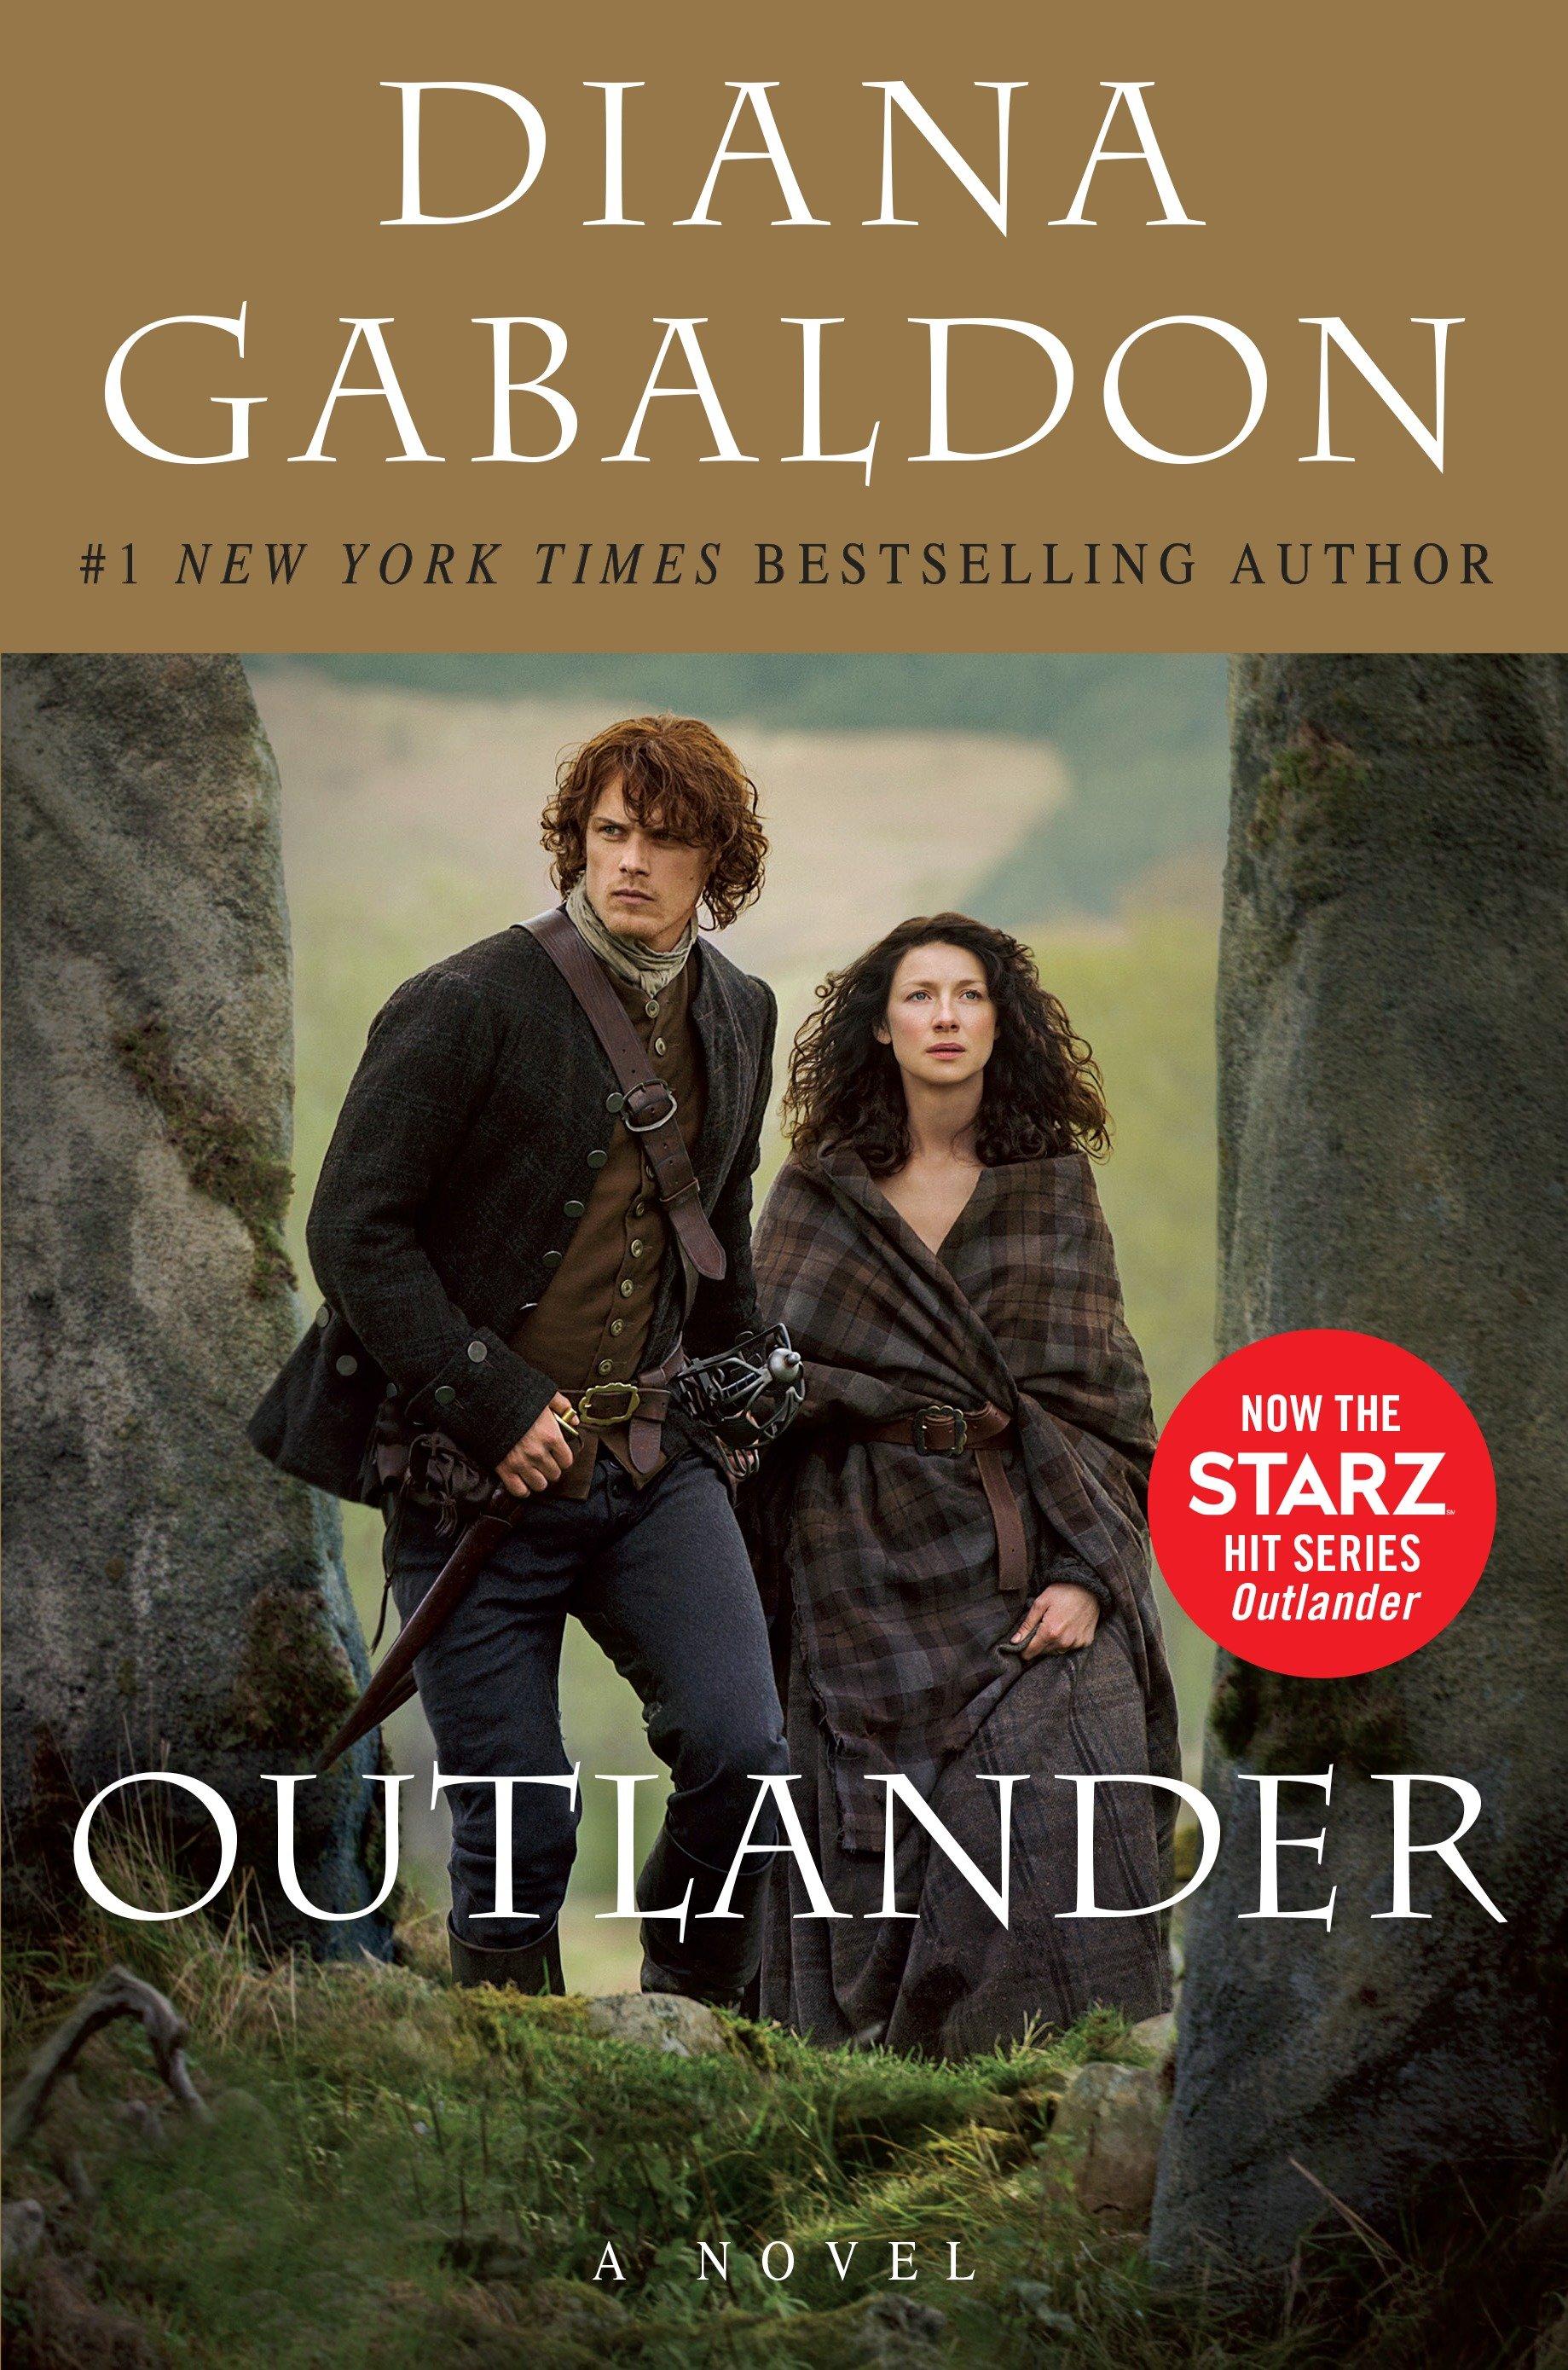 Outlander cover image